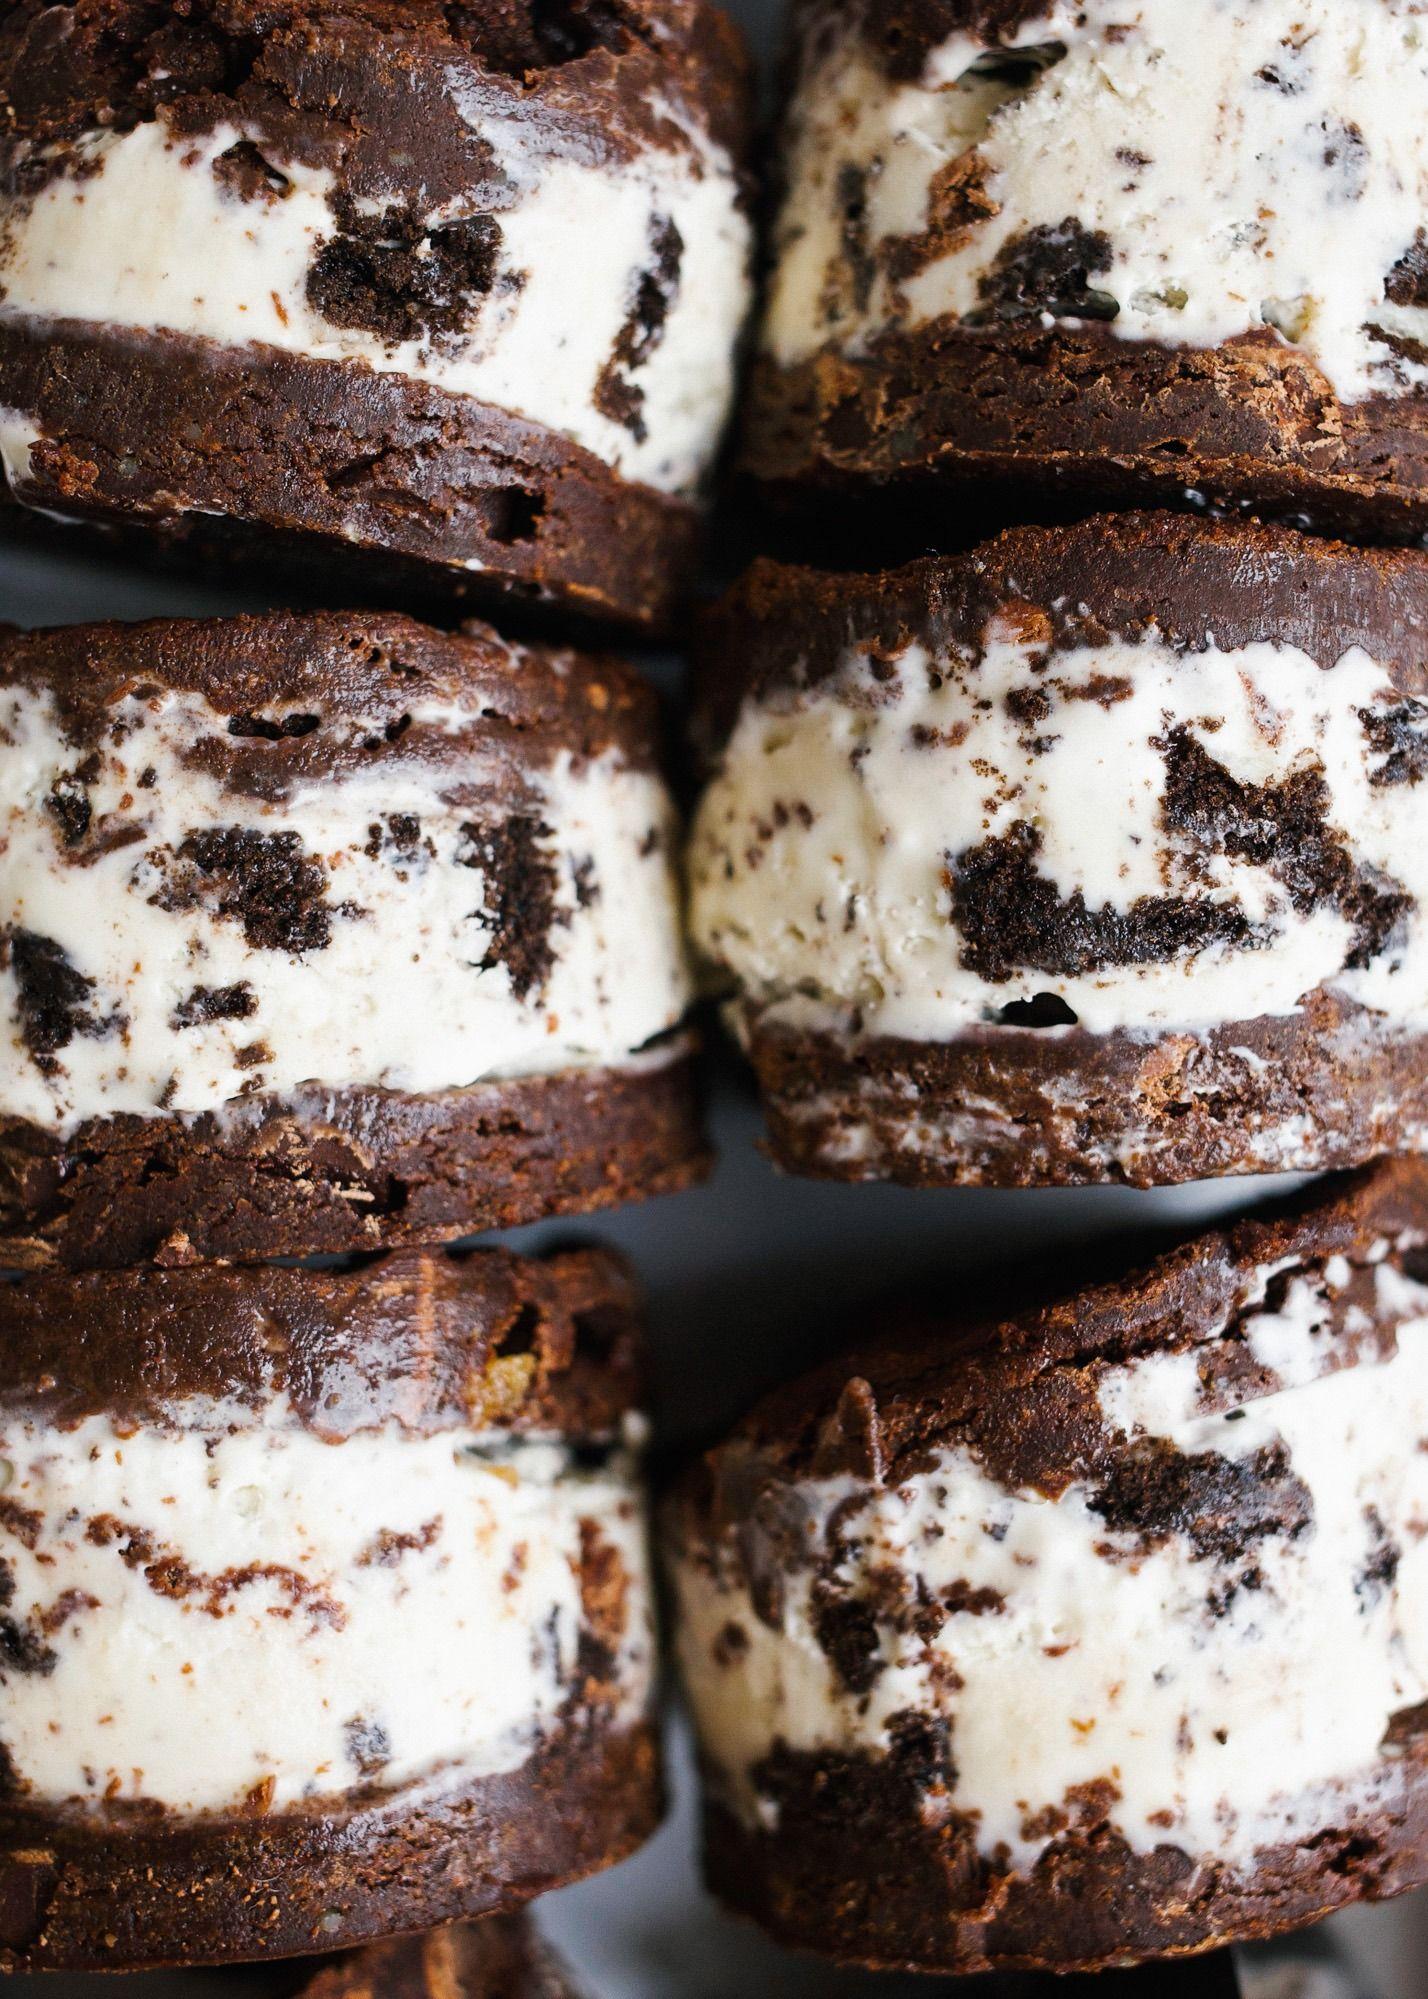 Brownie Ice Cream Sandwiches - Wood & Spoon